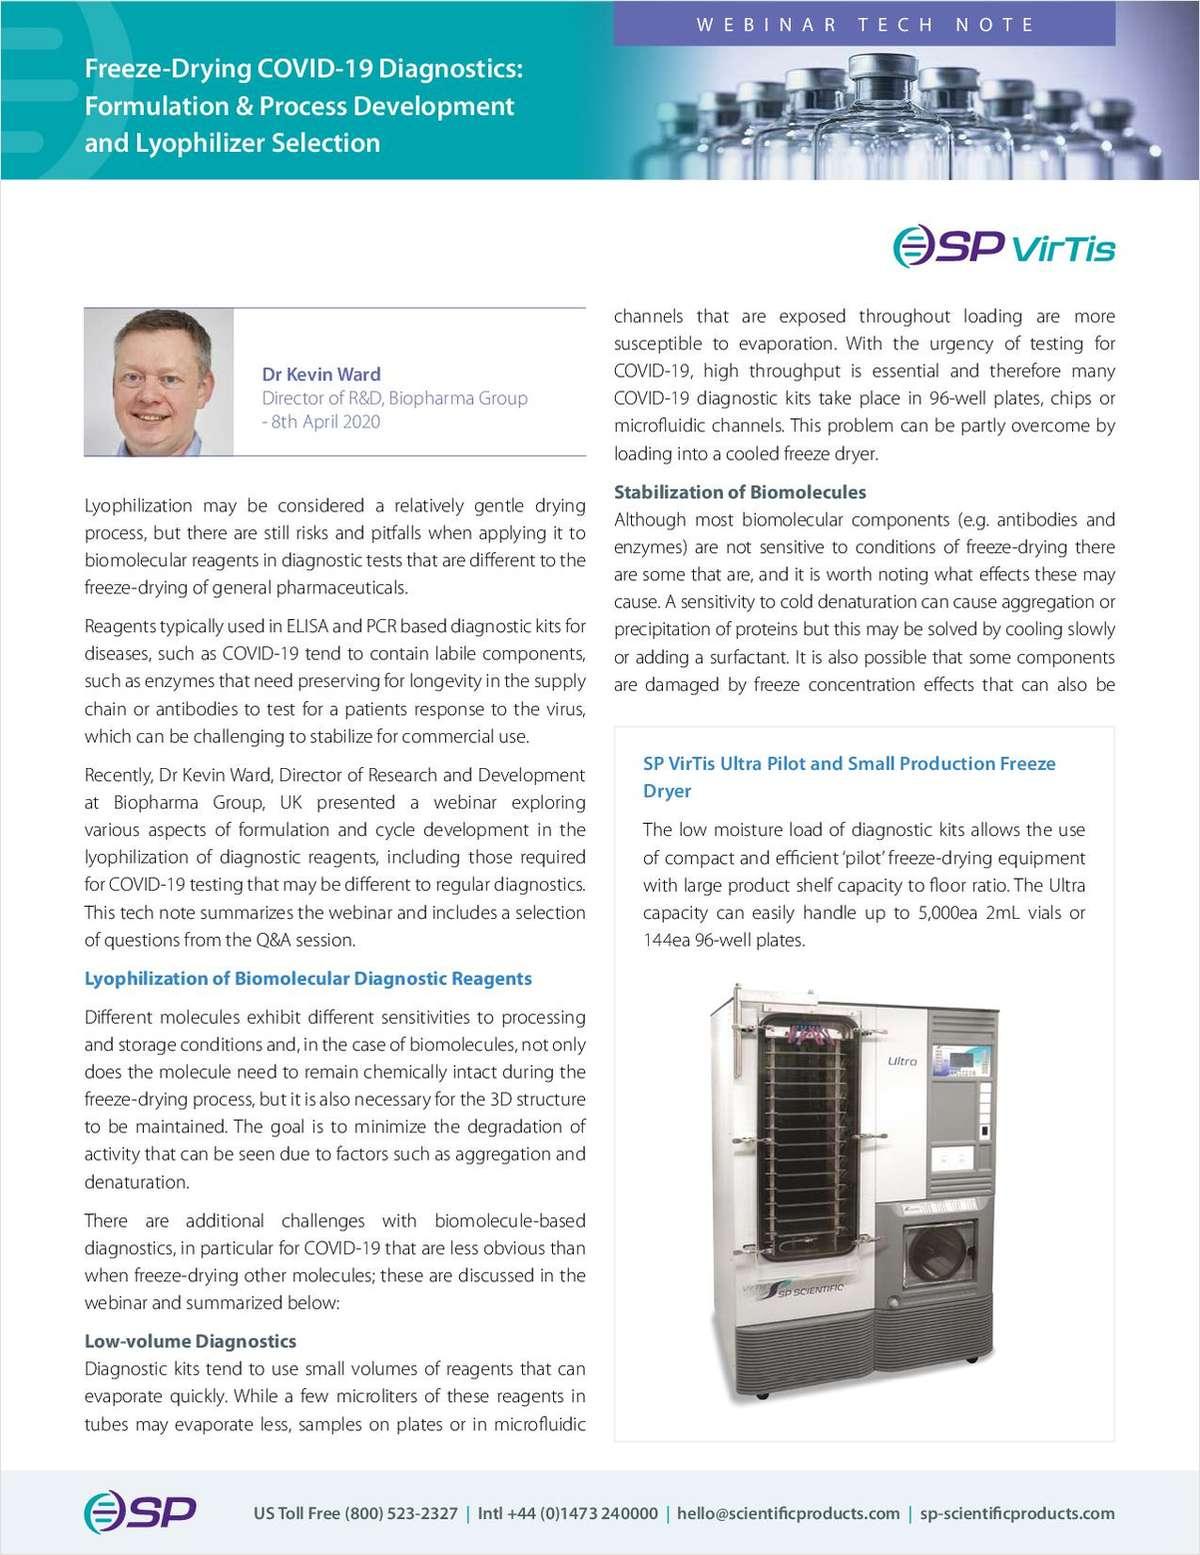 Freeze-Drying COVID-19 Diagnostics: Formulation & Process Development and Lyophilizer Selection